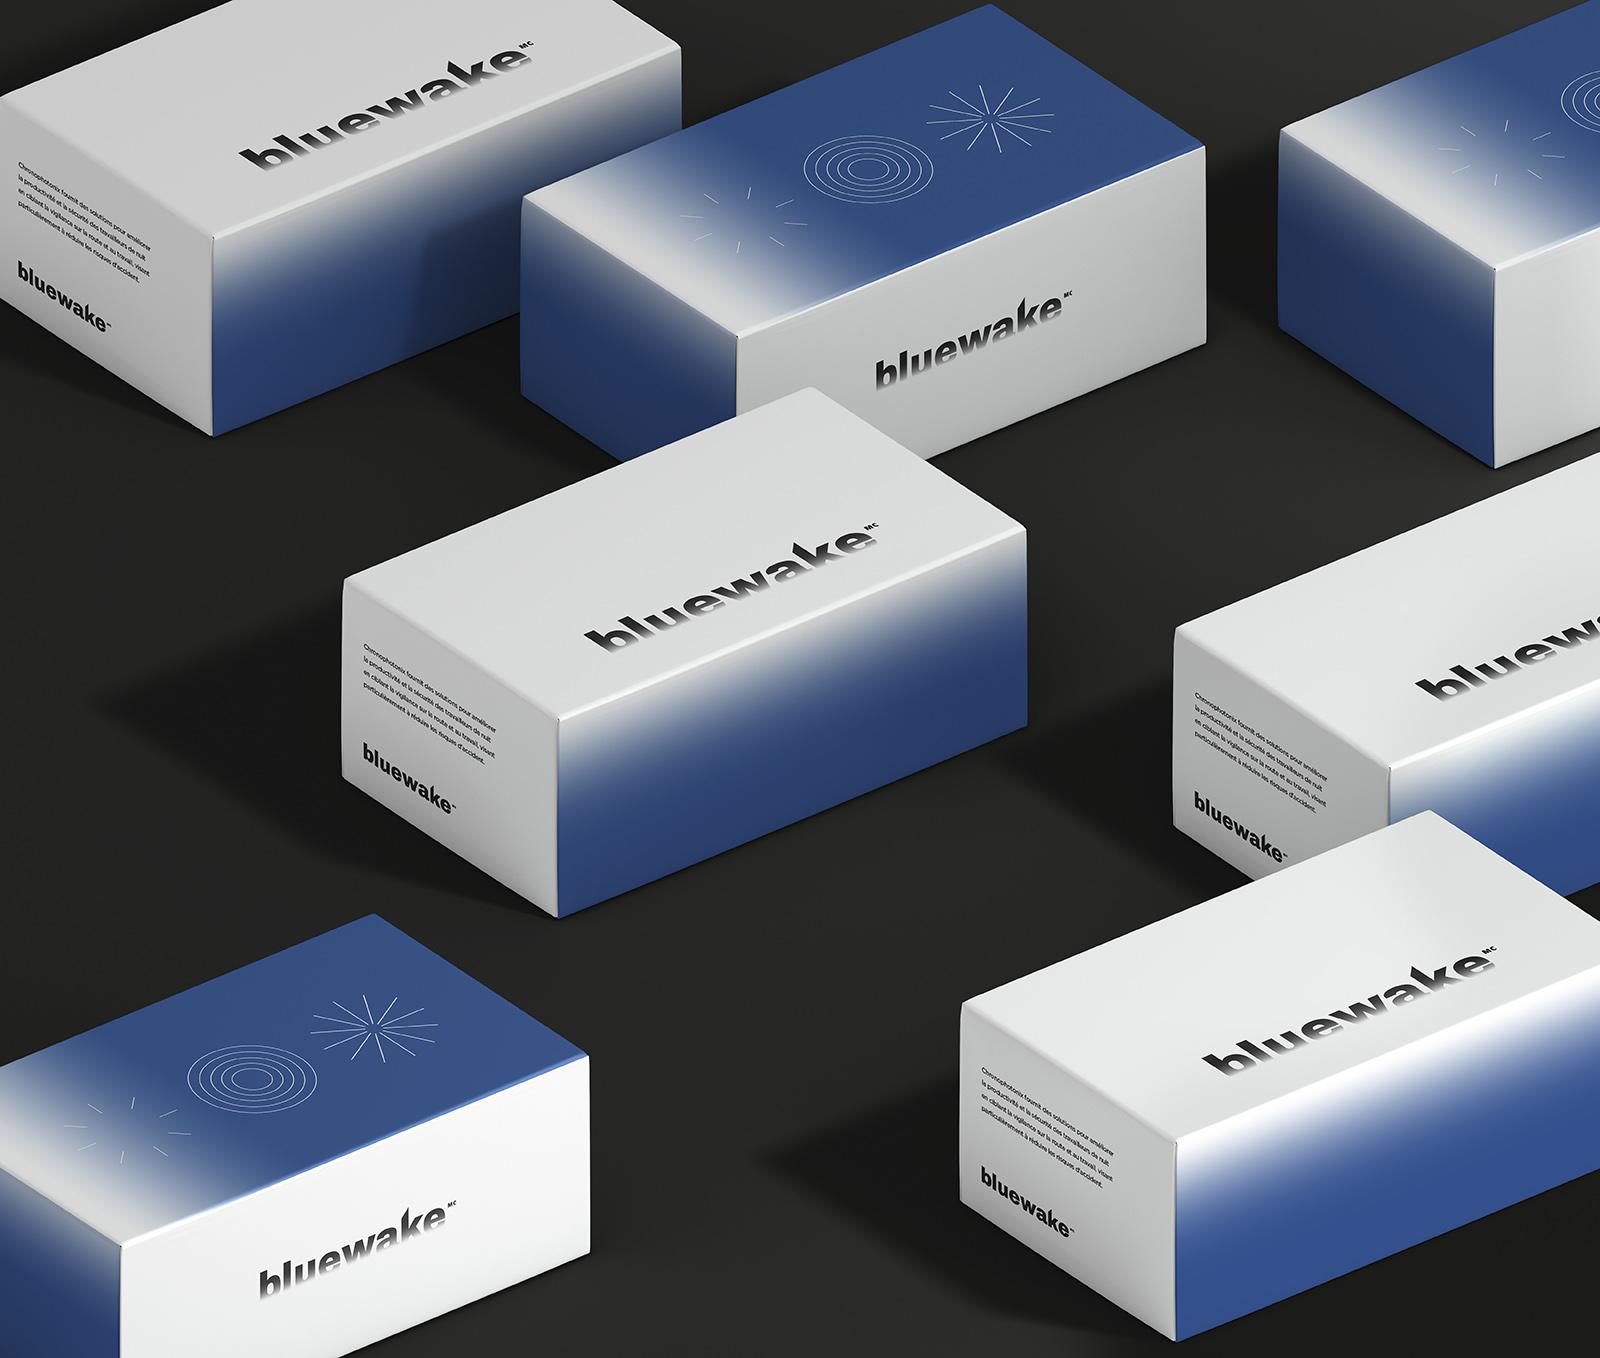 packaging bluewake